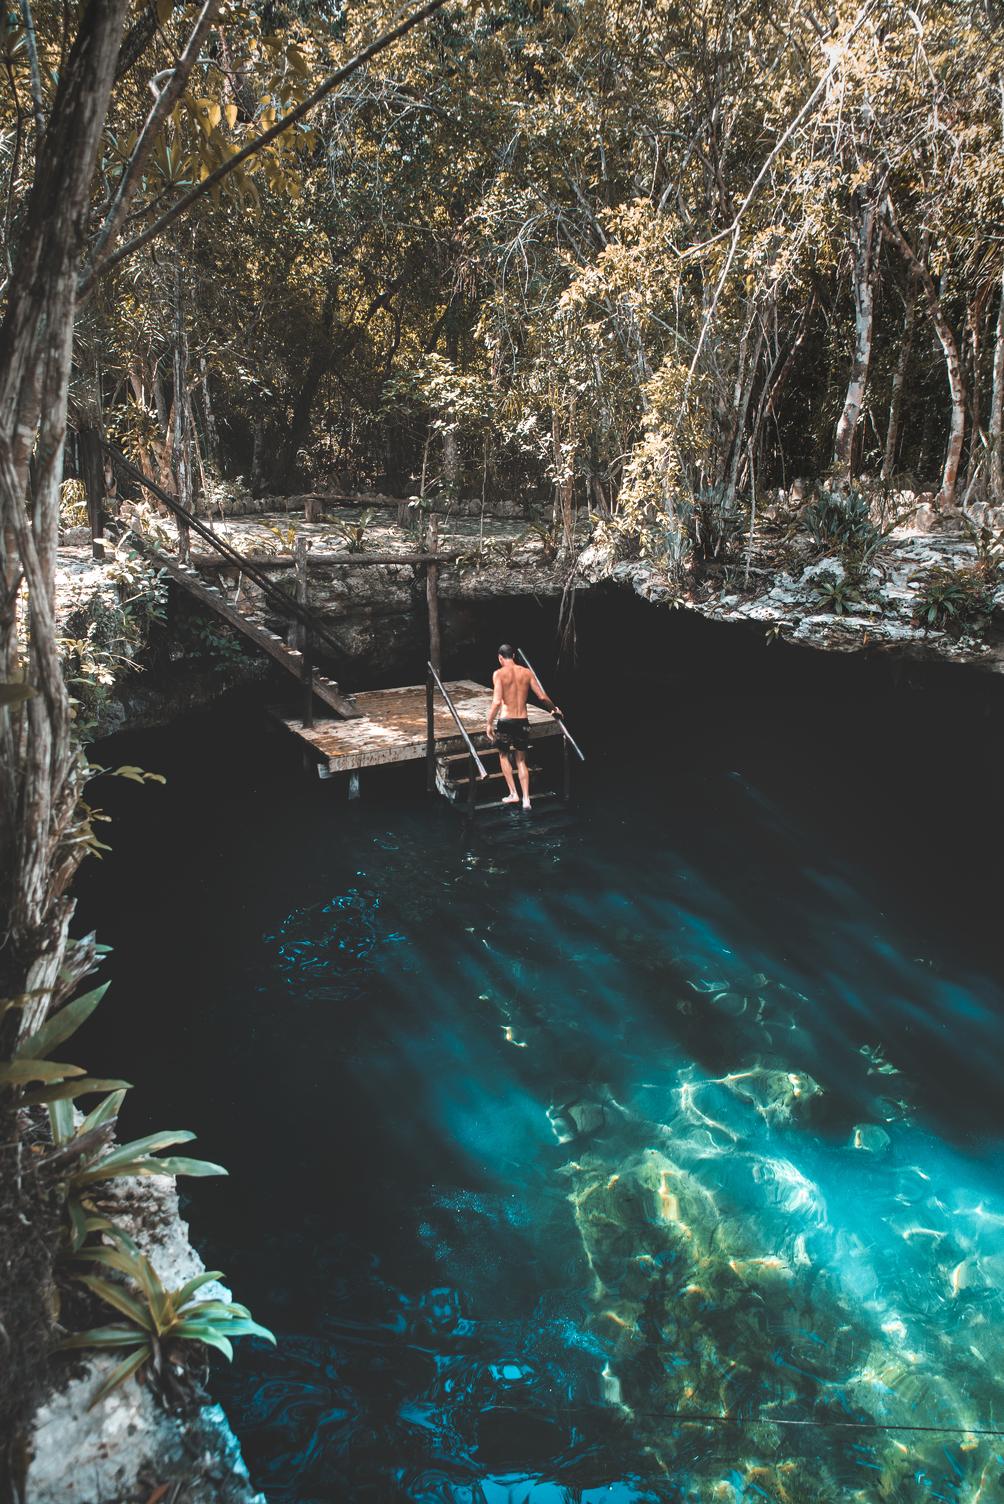 UNICO_Lifestyle cenote 01.jpg